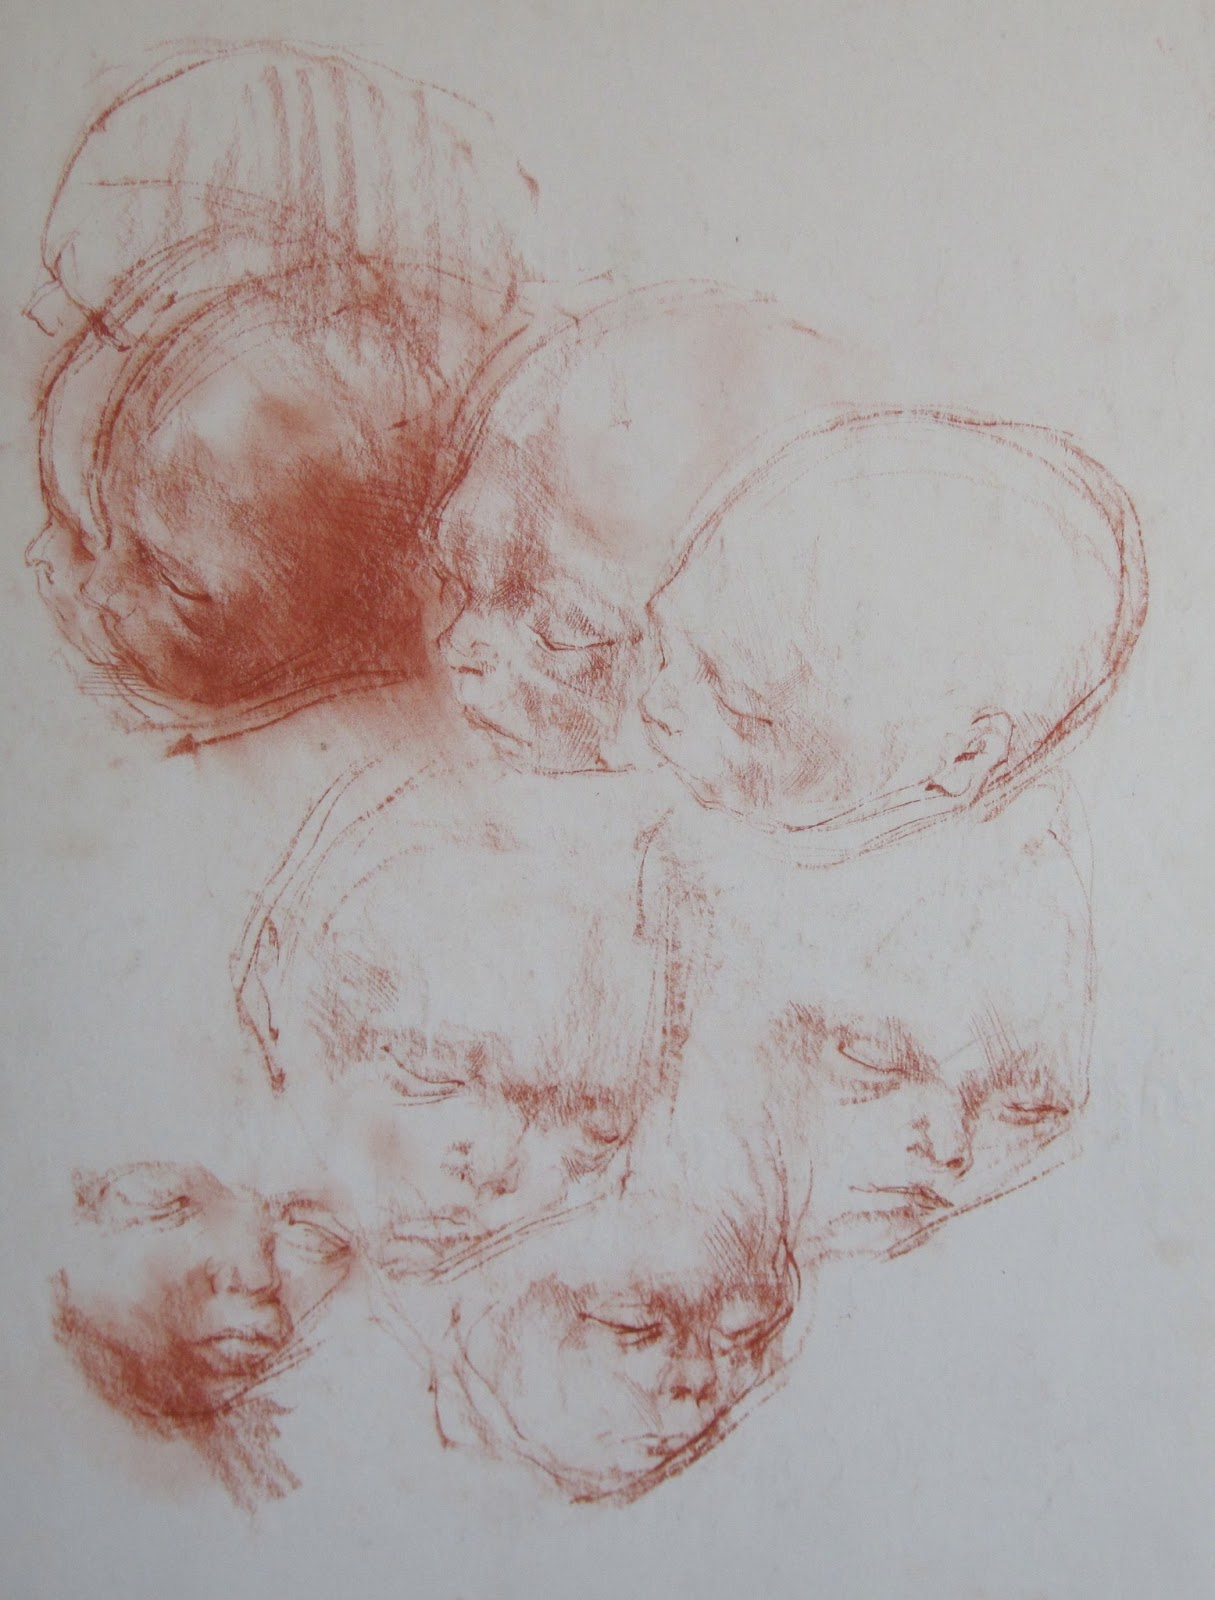 Steven Rhude Paintings Anatomy Still An Option